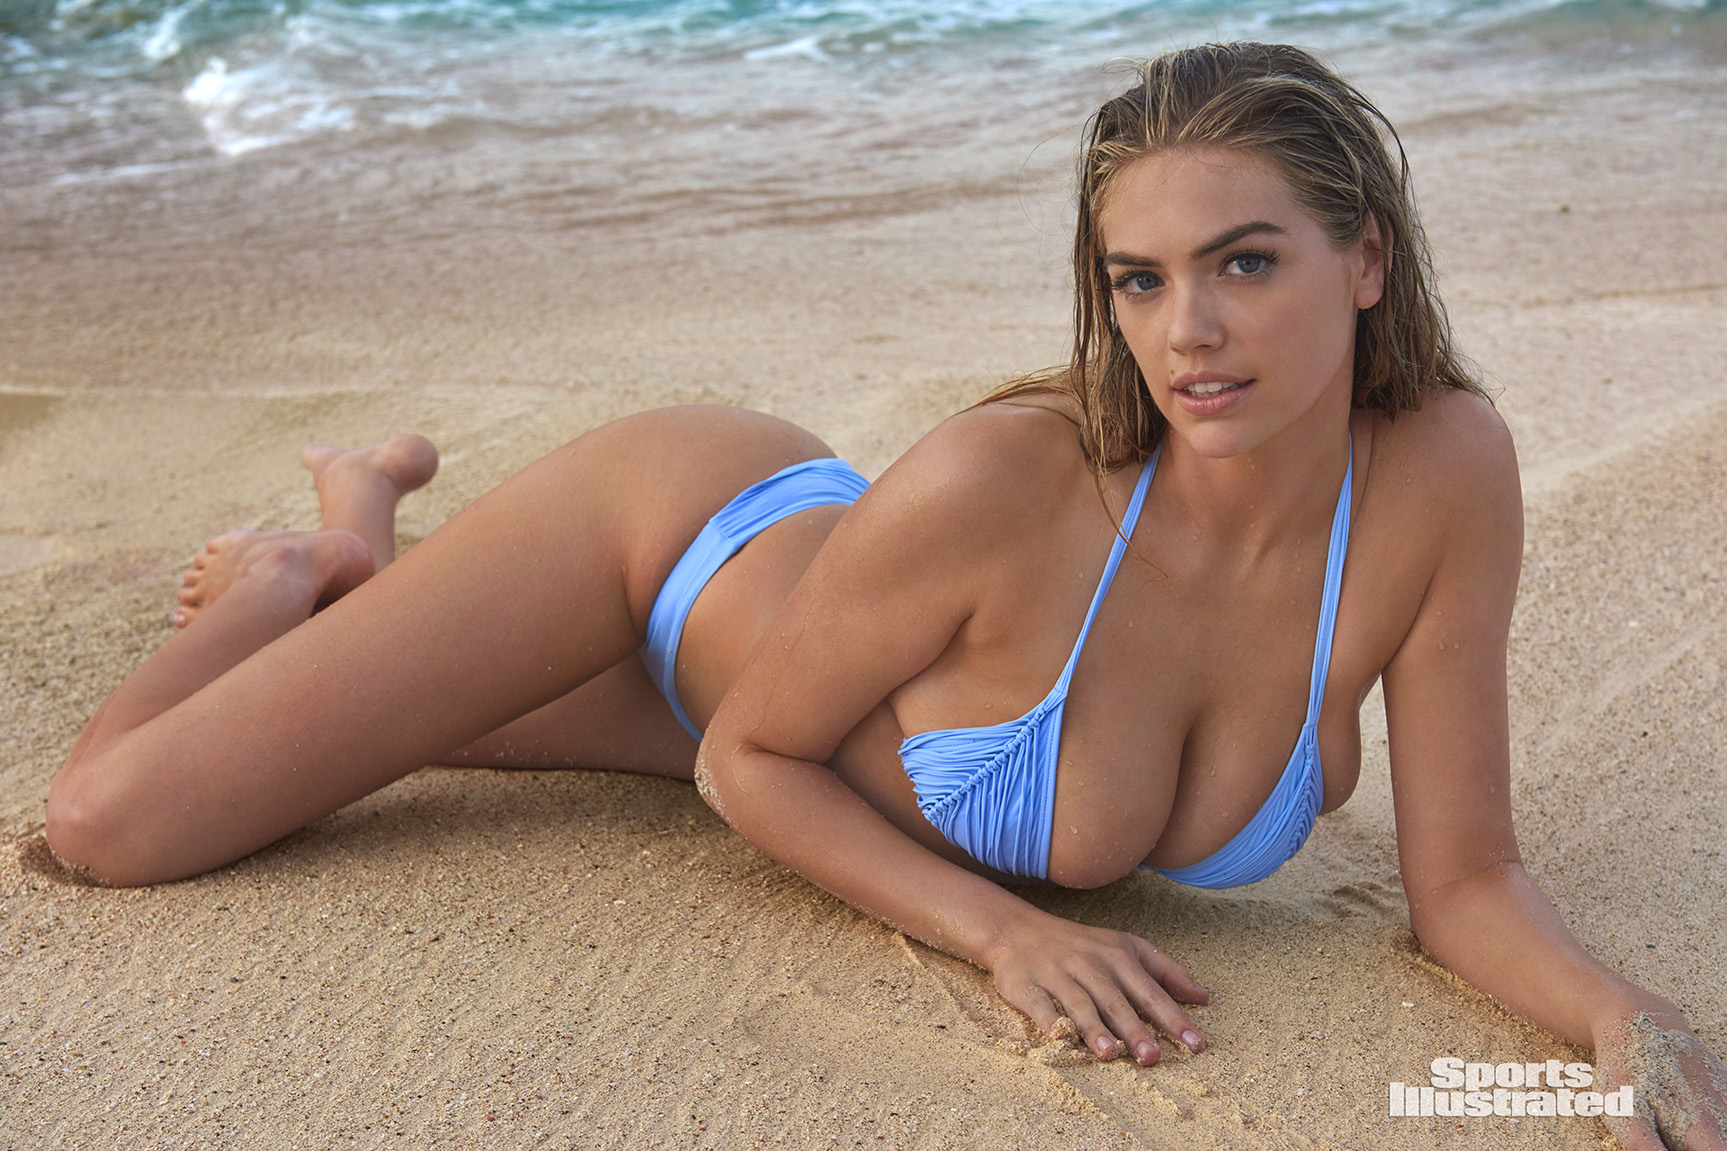 Kate Upton / Кейт Аптон в купальниках из новой коллекции Sports Illustrated Swimsuit 2018 issue / in Aruba by Yu Tsai